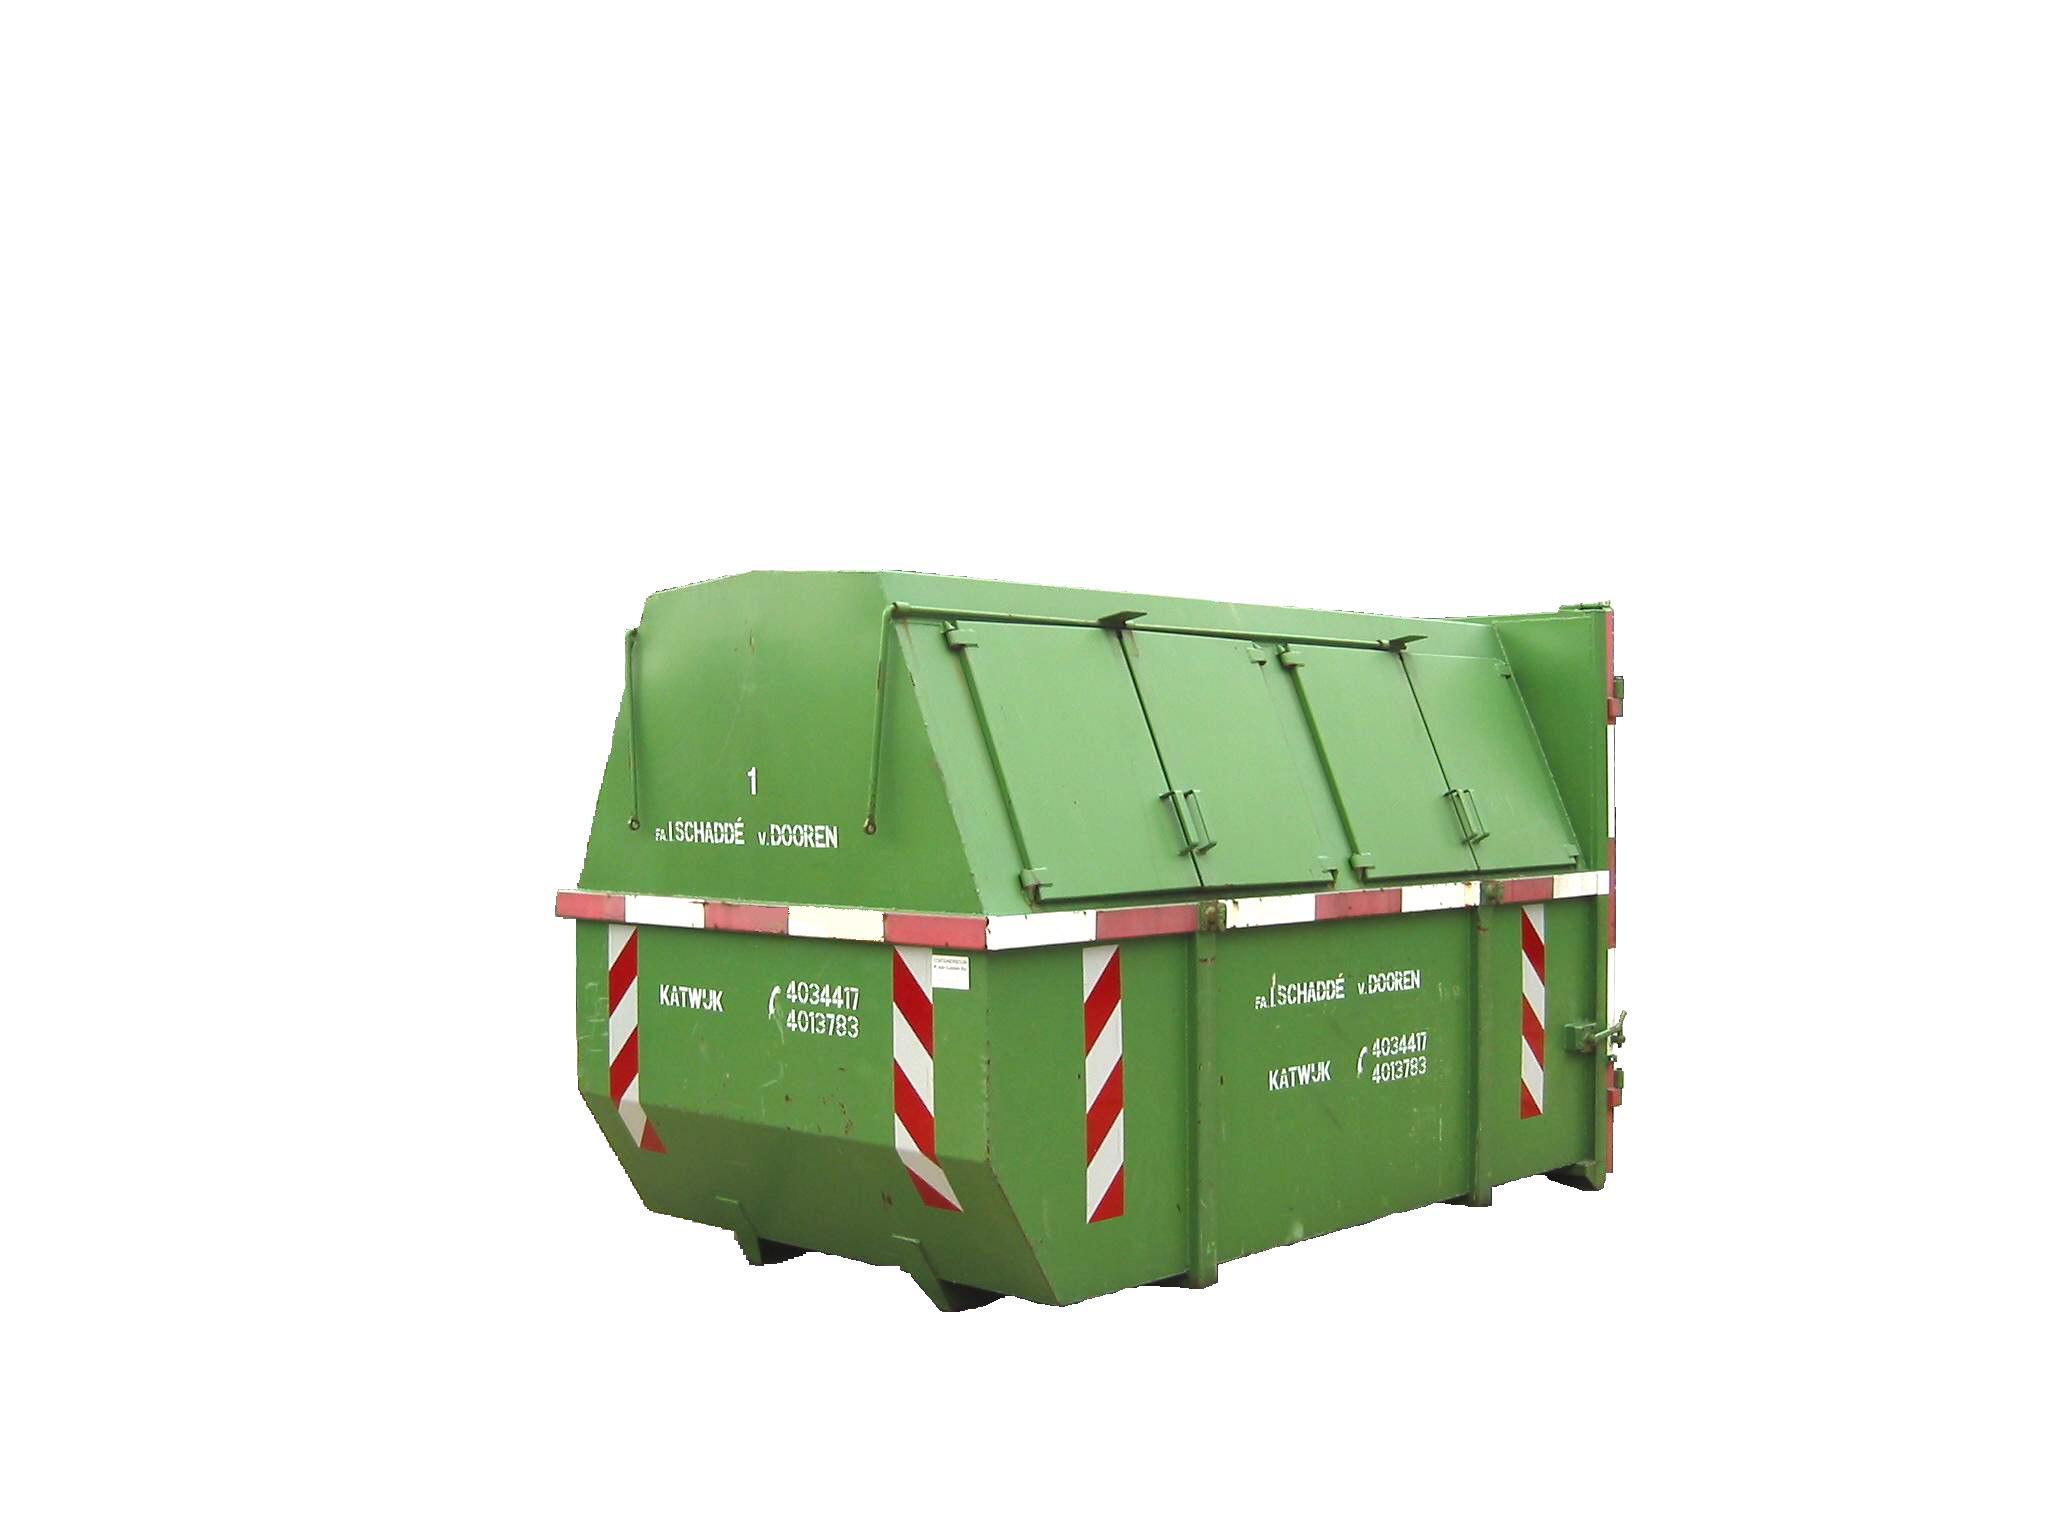 Gesloten container 10m3